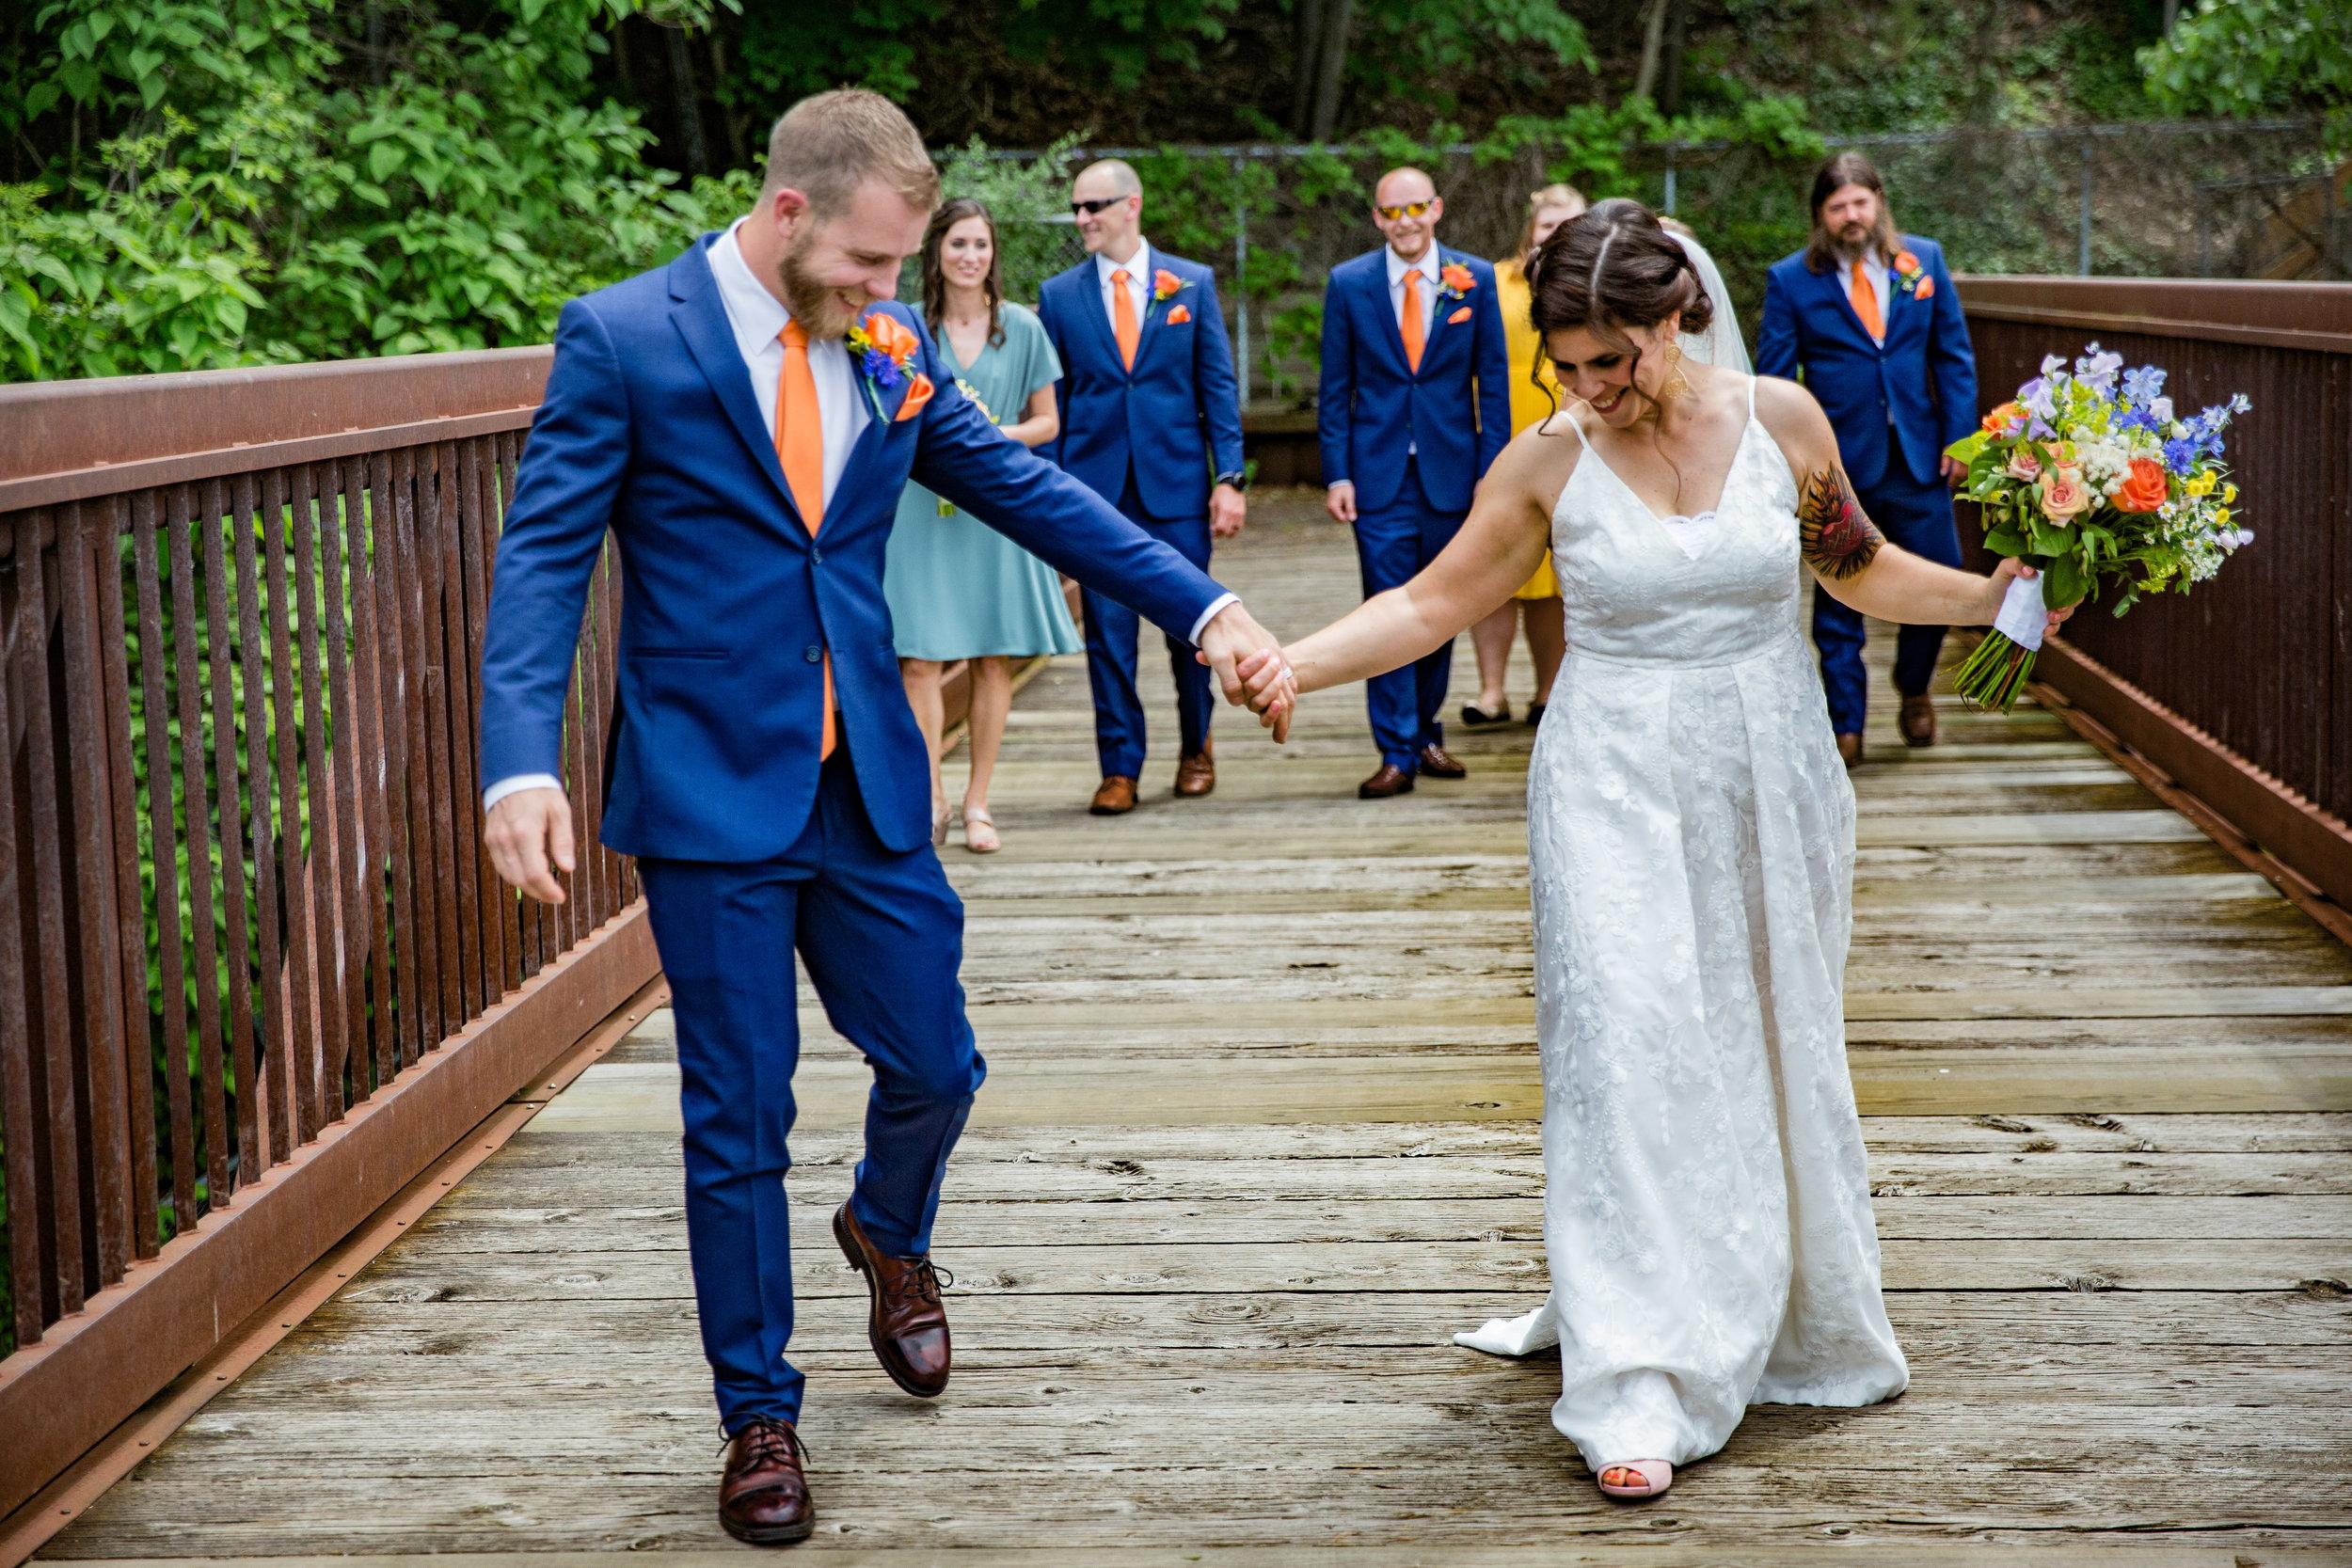 Natalie and Dallas Mooney Wedding 6-8-19_Tania Watt Photography-248.jpg